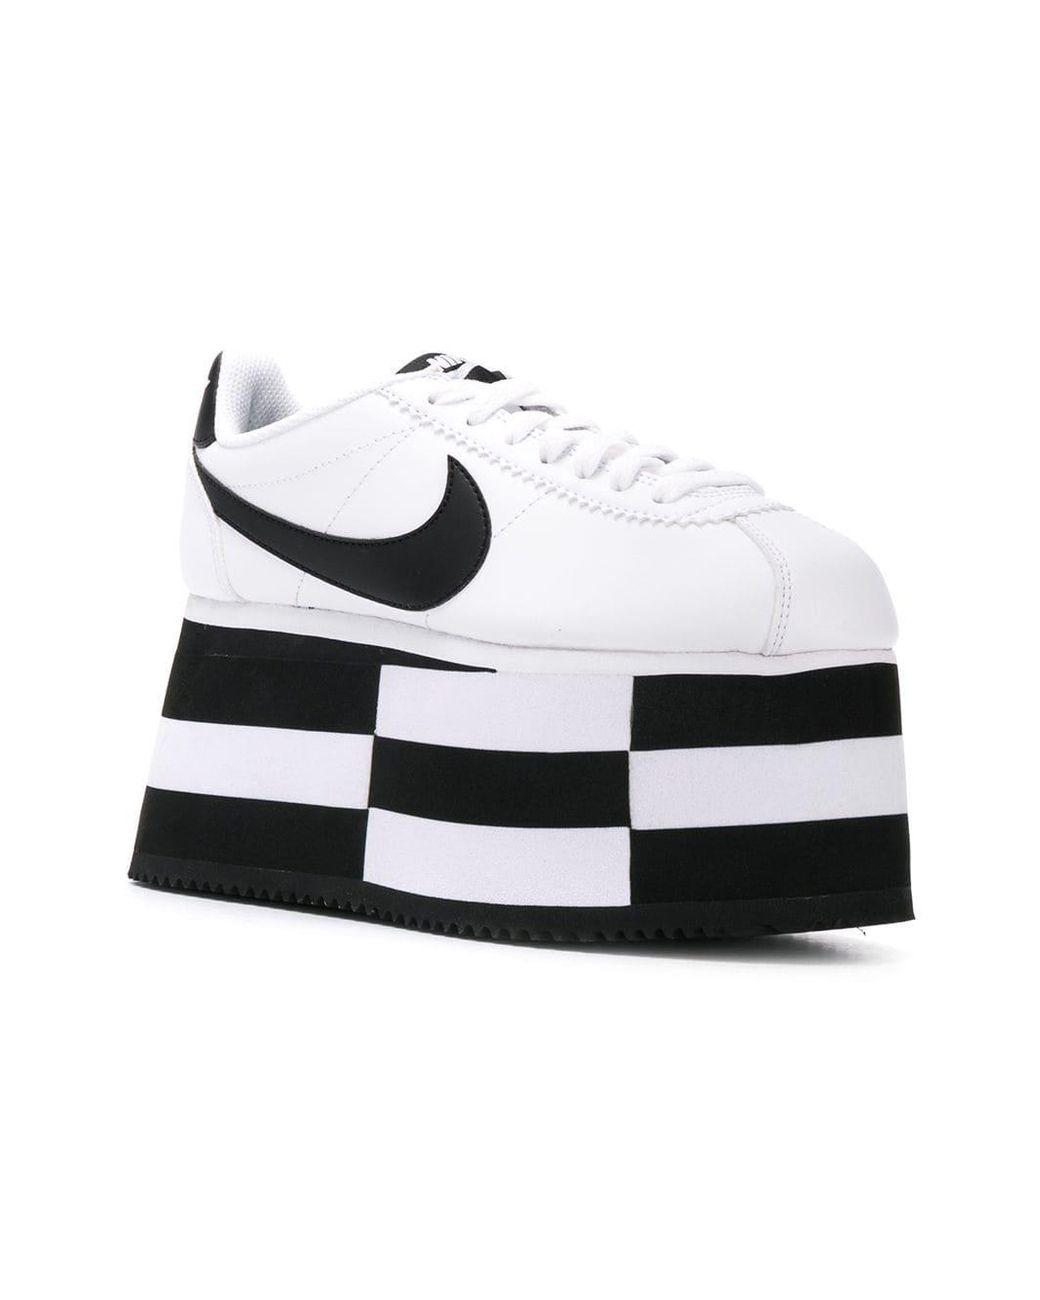 427ff035d Lyst - Comme des Garçons X Nike Platform Sneakers in White - Save 16%